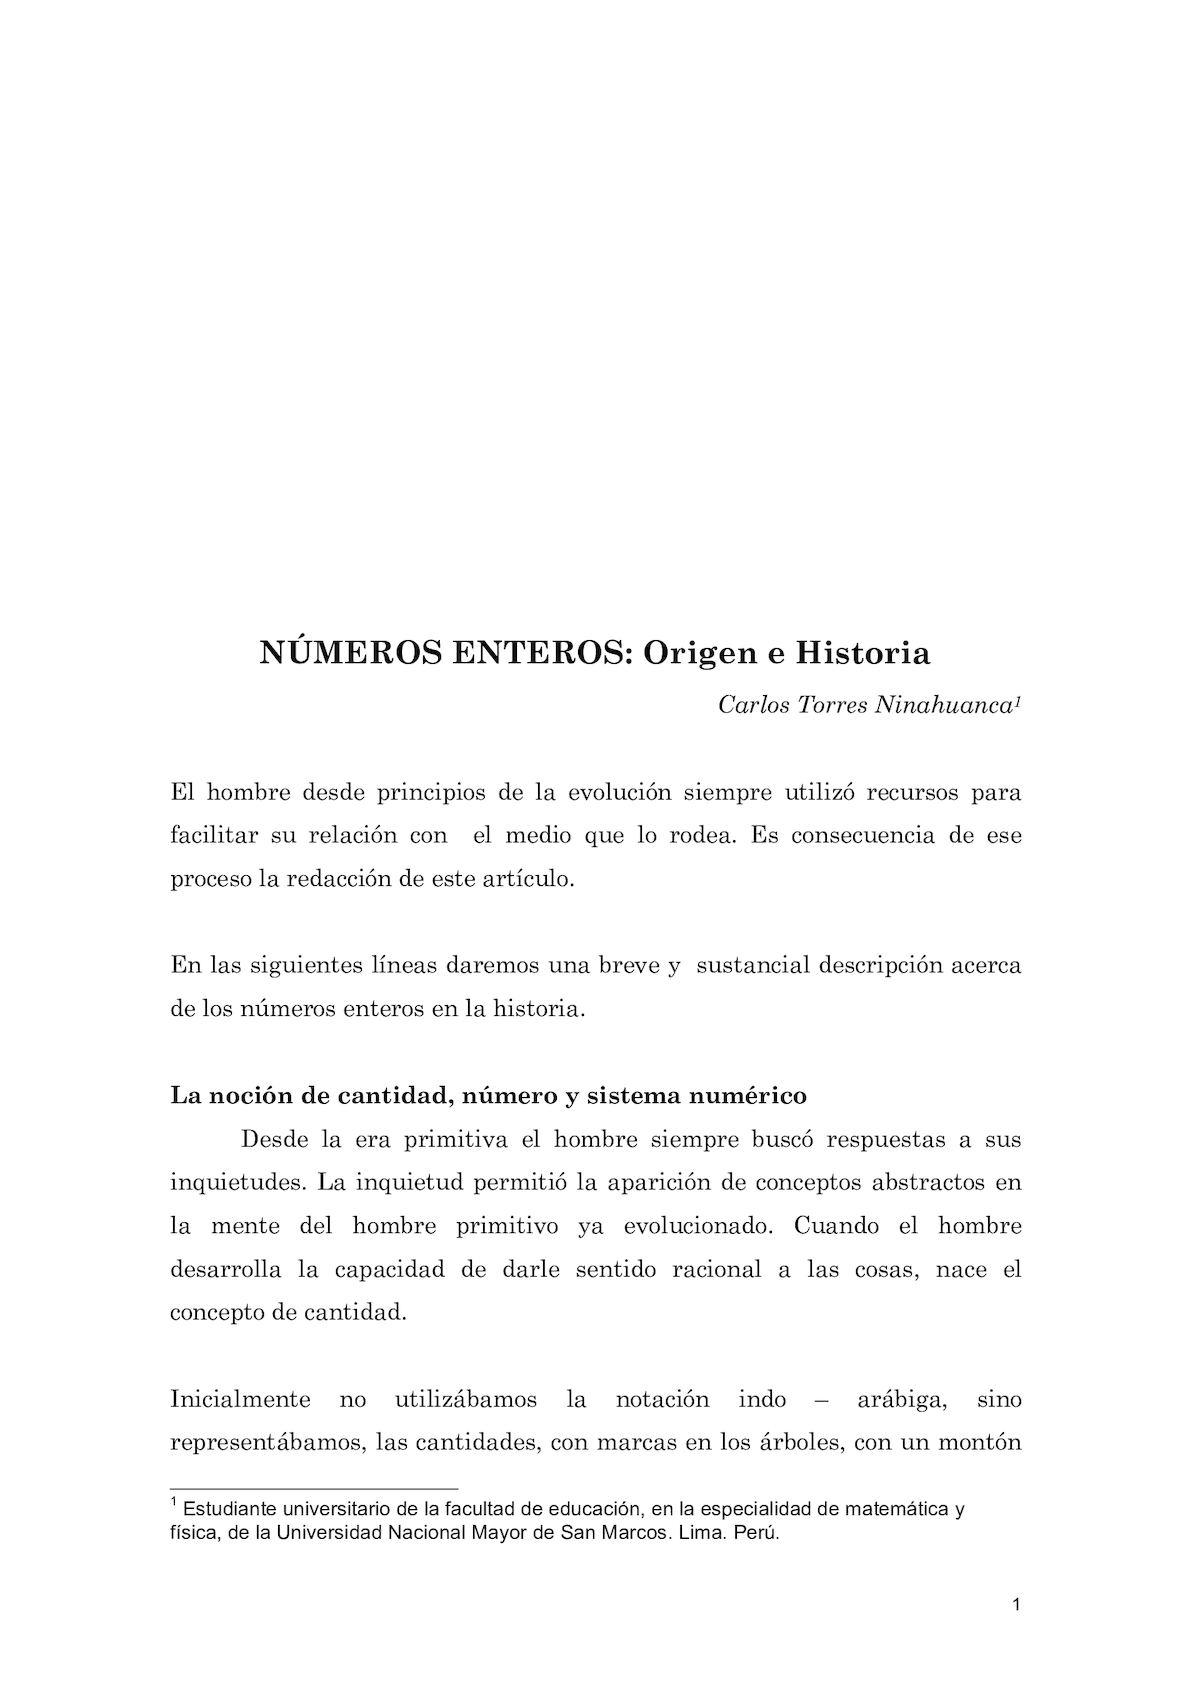 NUMEROS ENTEROS   ORIGEN E HISTORIA 1